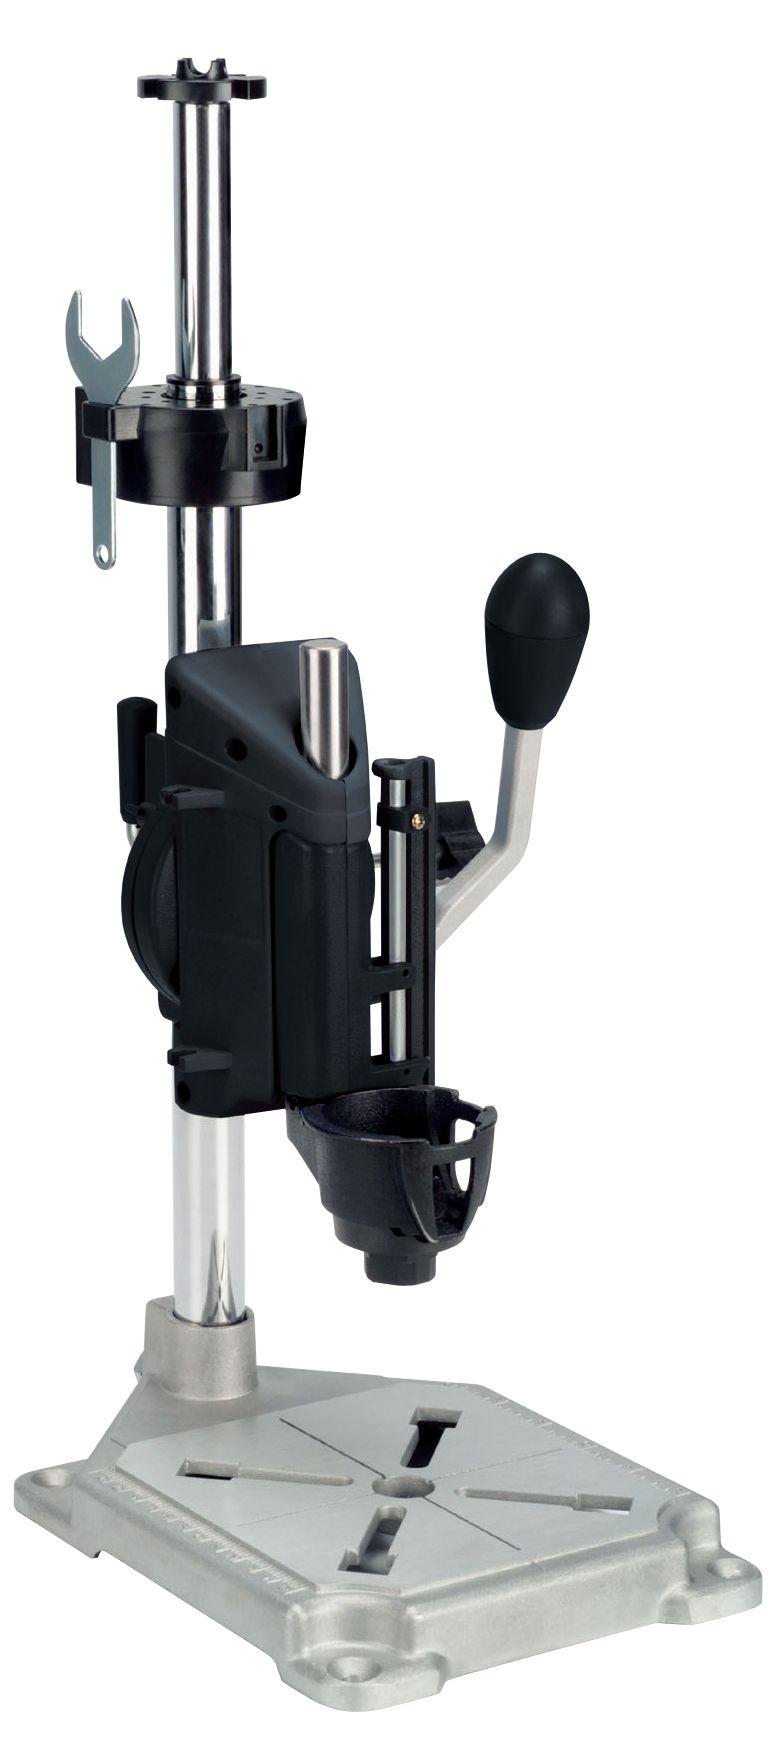 Craftsman Drill Press Tool Amp Flex Shaft Holder Combo